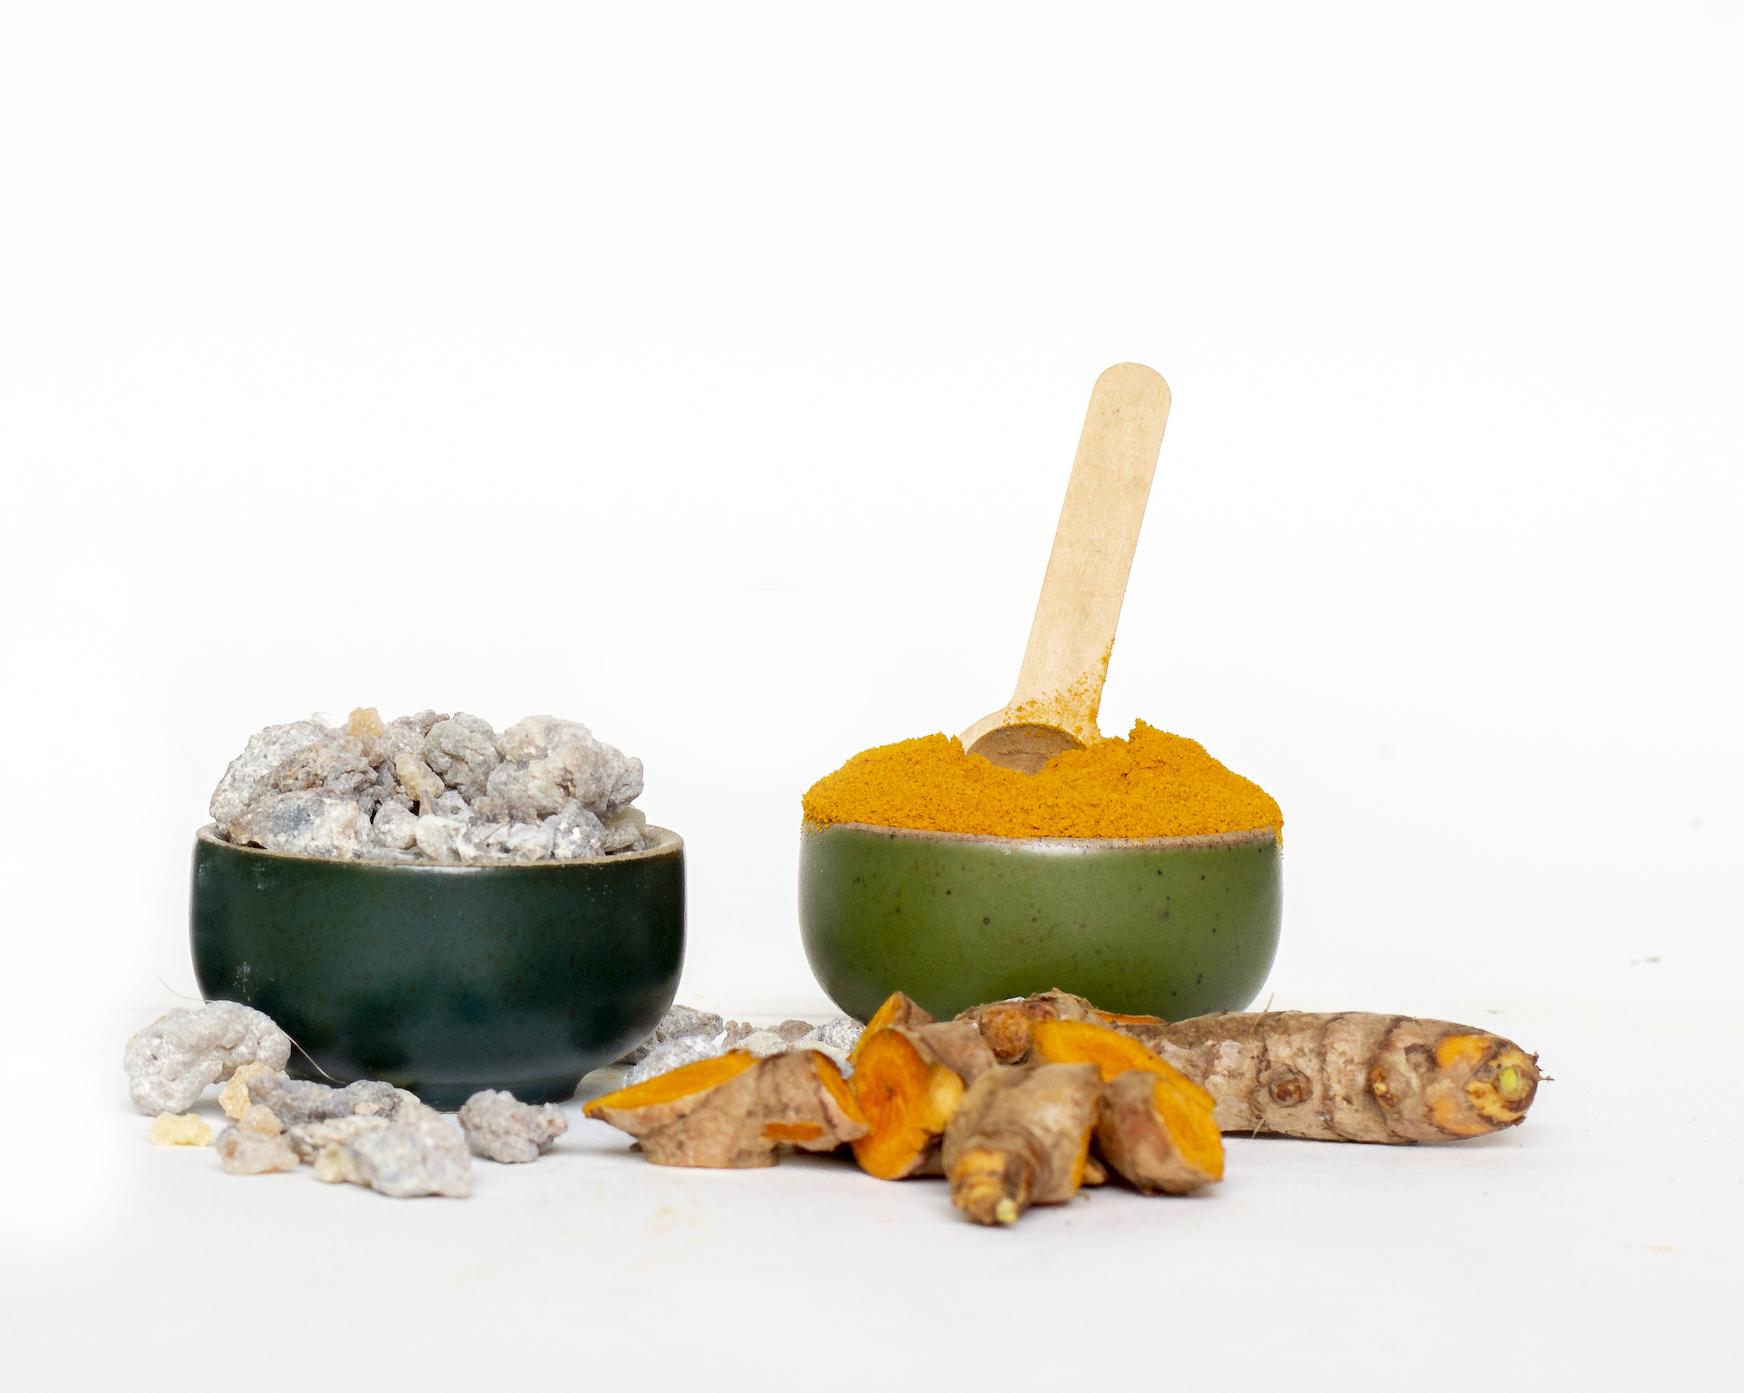 RHULEAVE-K®- Powerful combination of Turmeric, Boswellia and Sesame oil